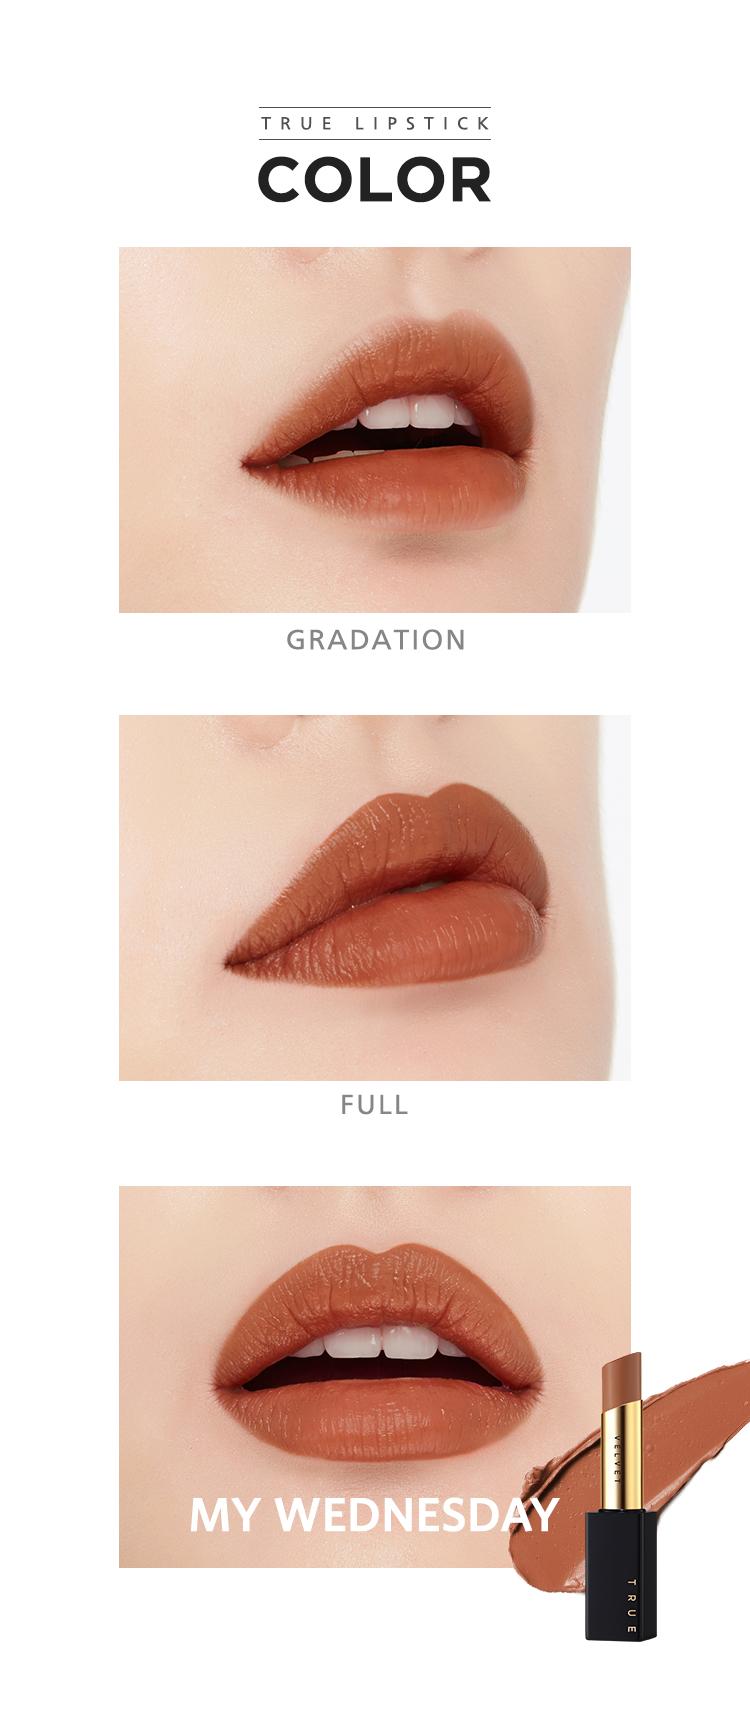 APIEU_True_Velvet_Lipstick_bf_BR01_02.jpg